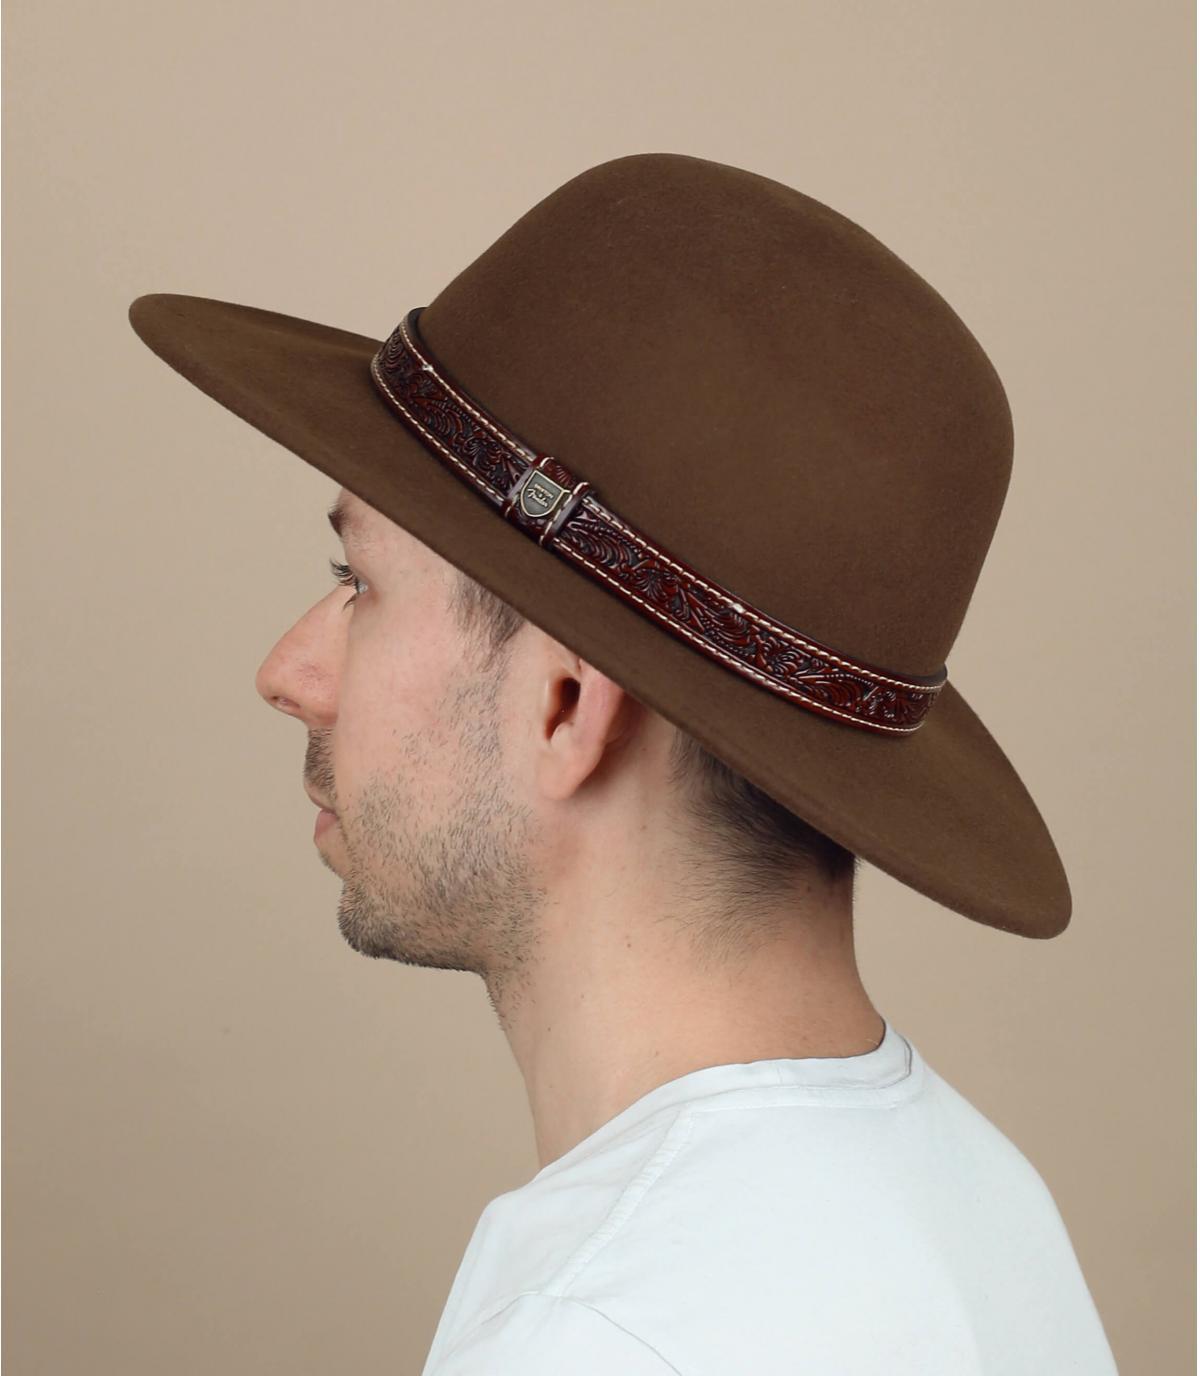 Brixton x Fender fluwelen hoed